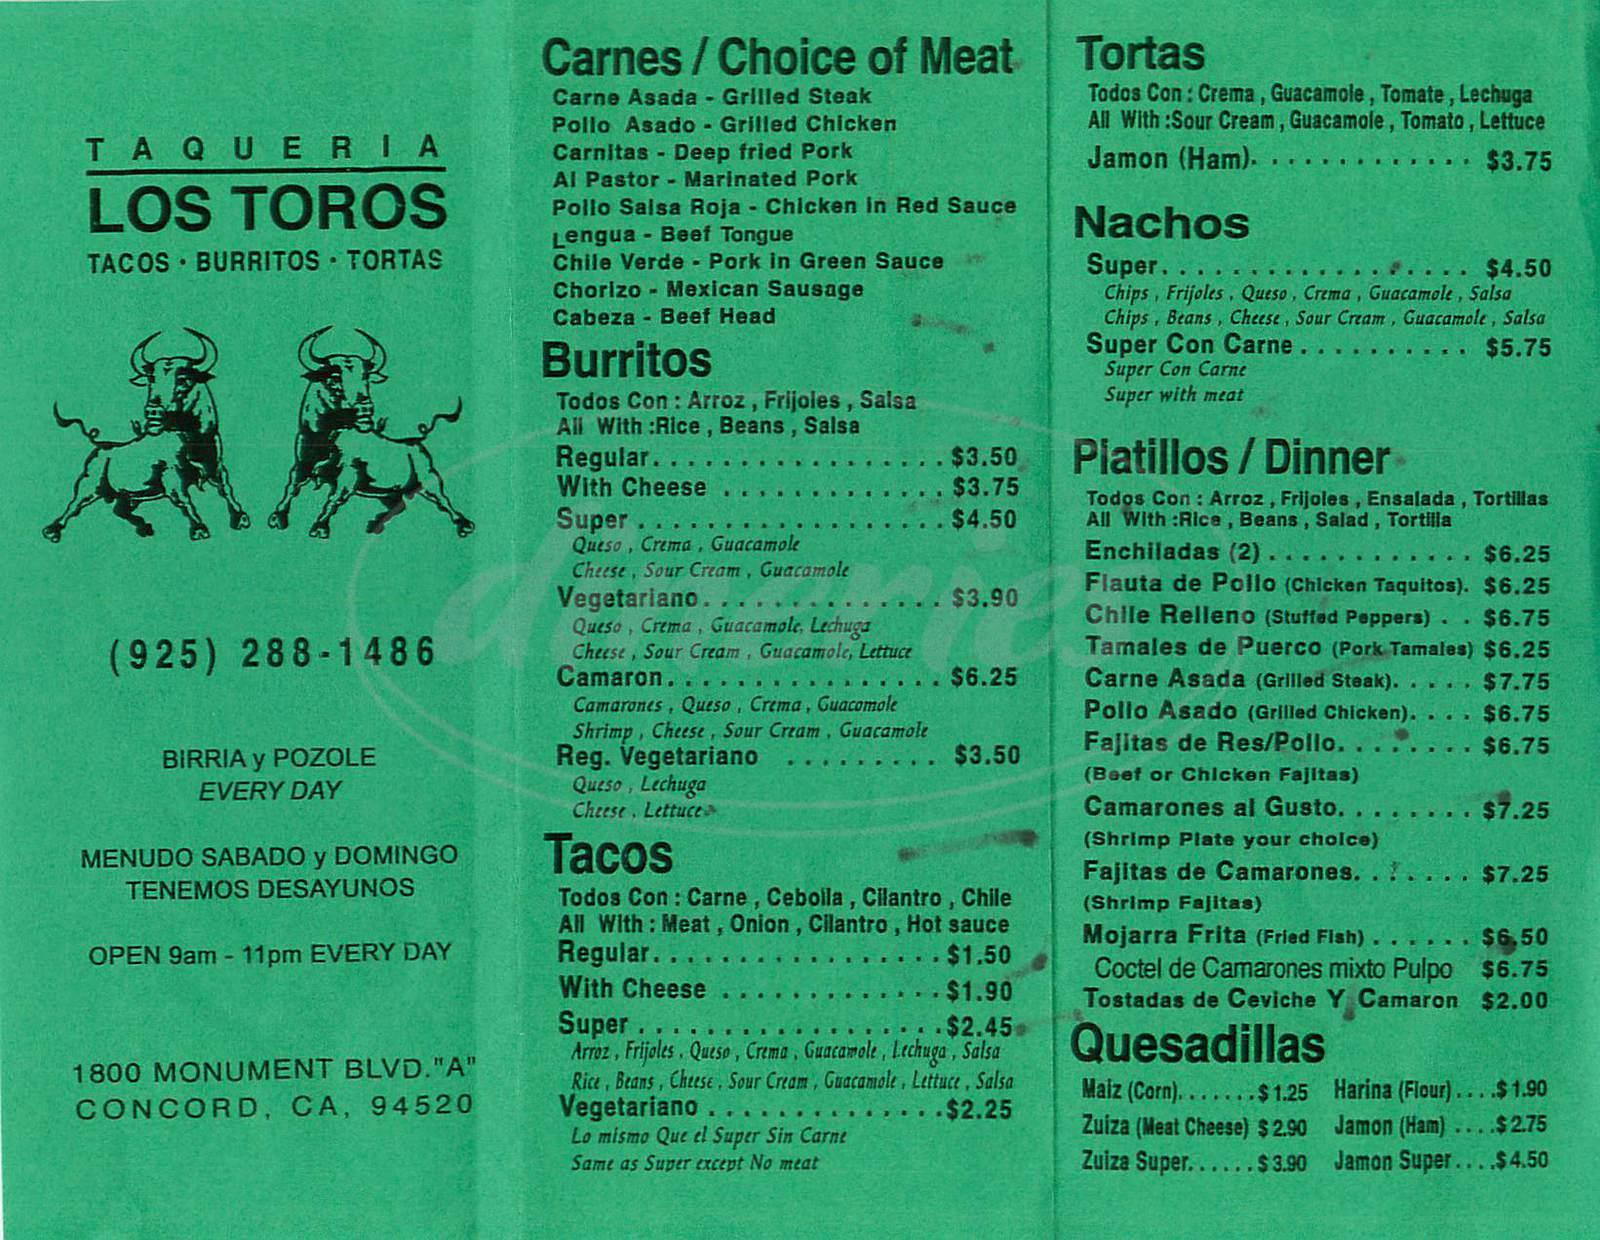 menu for Taqueria Los Toros